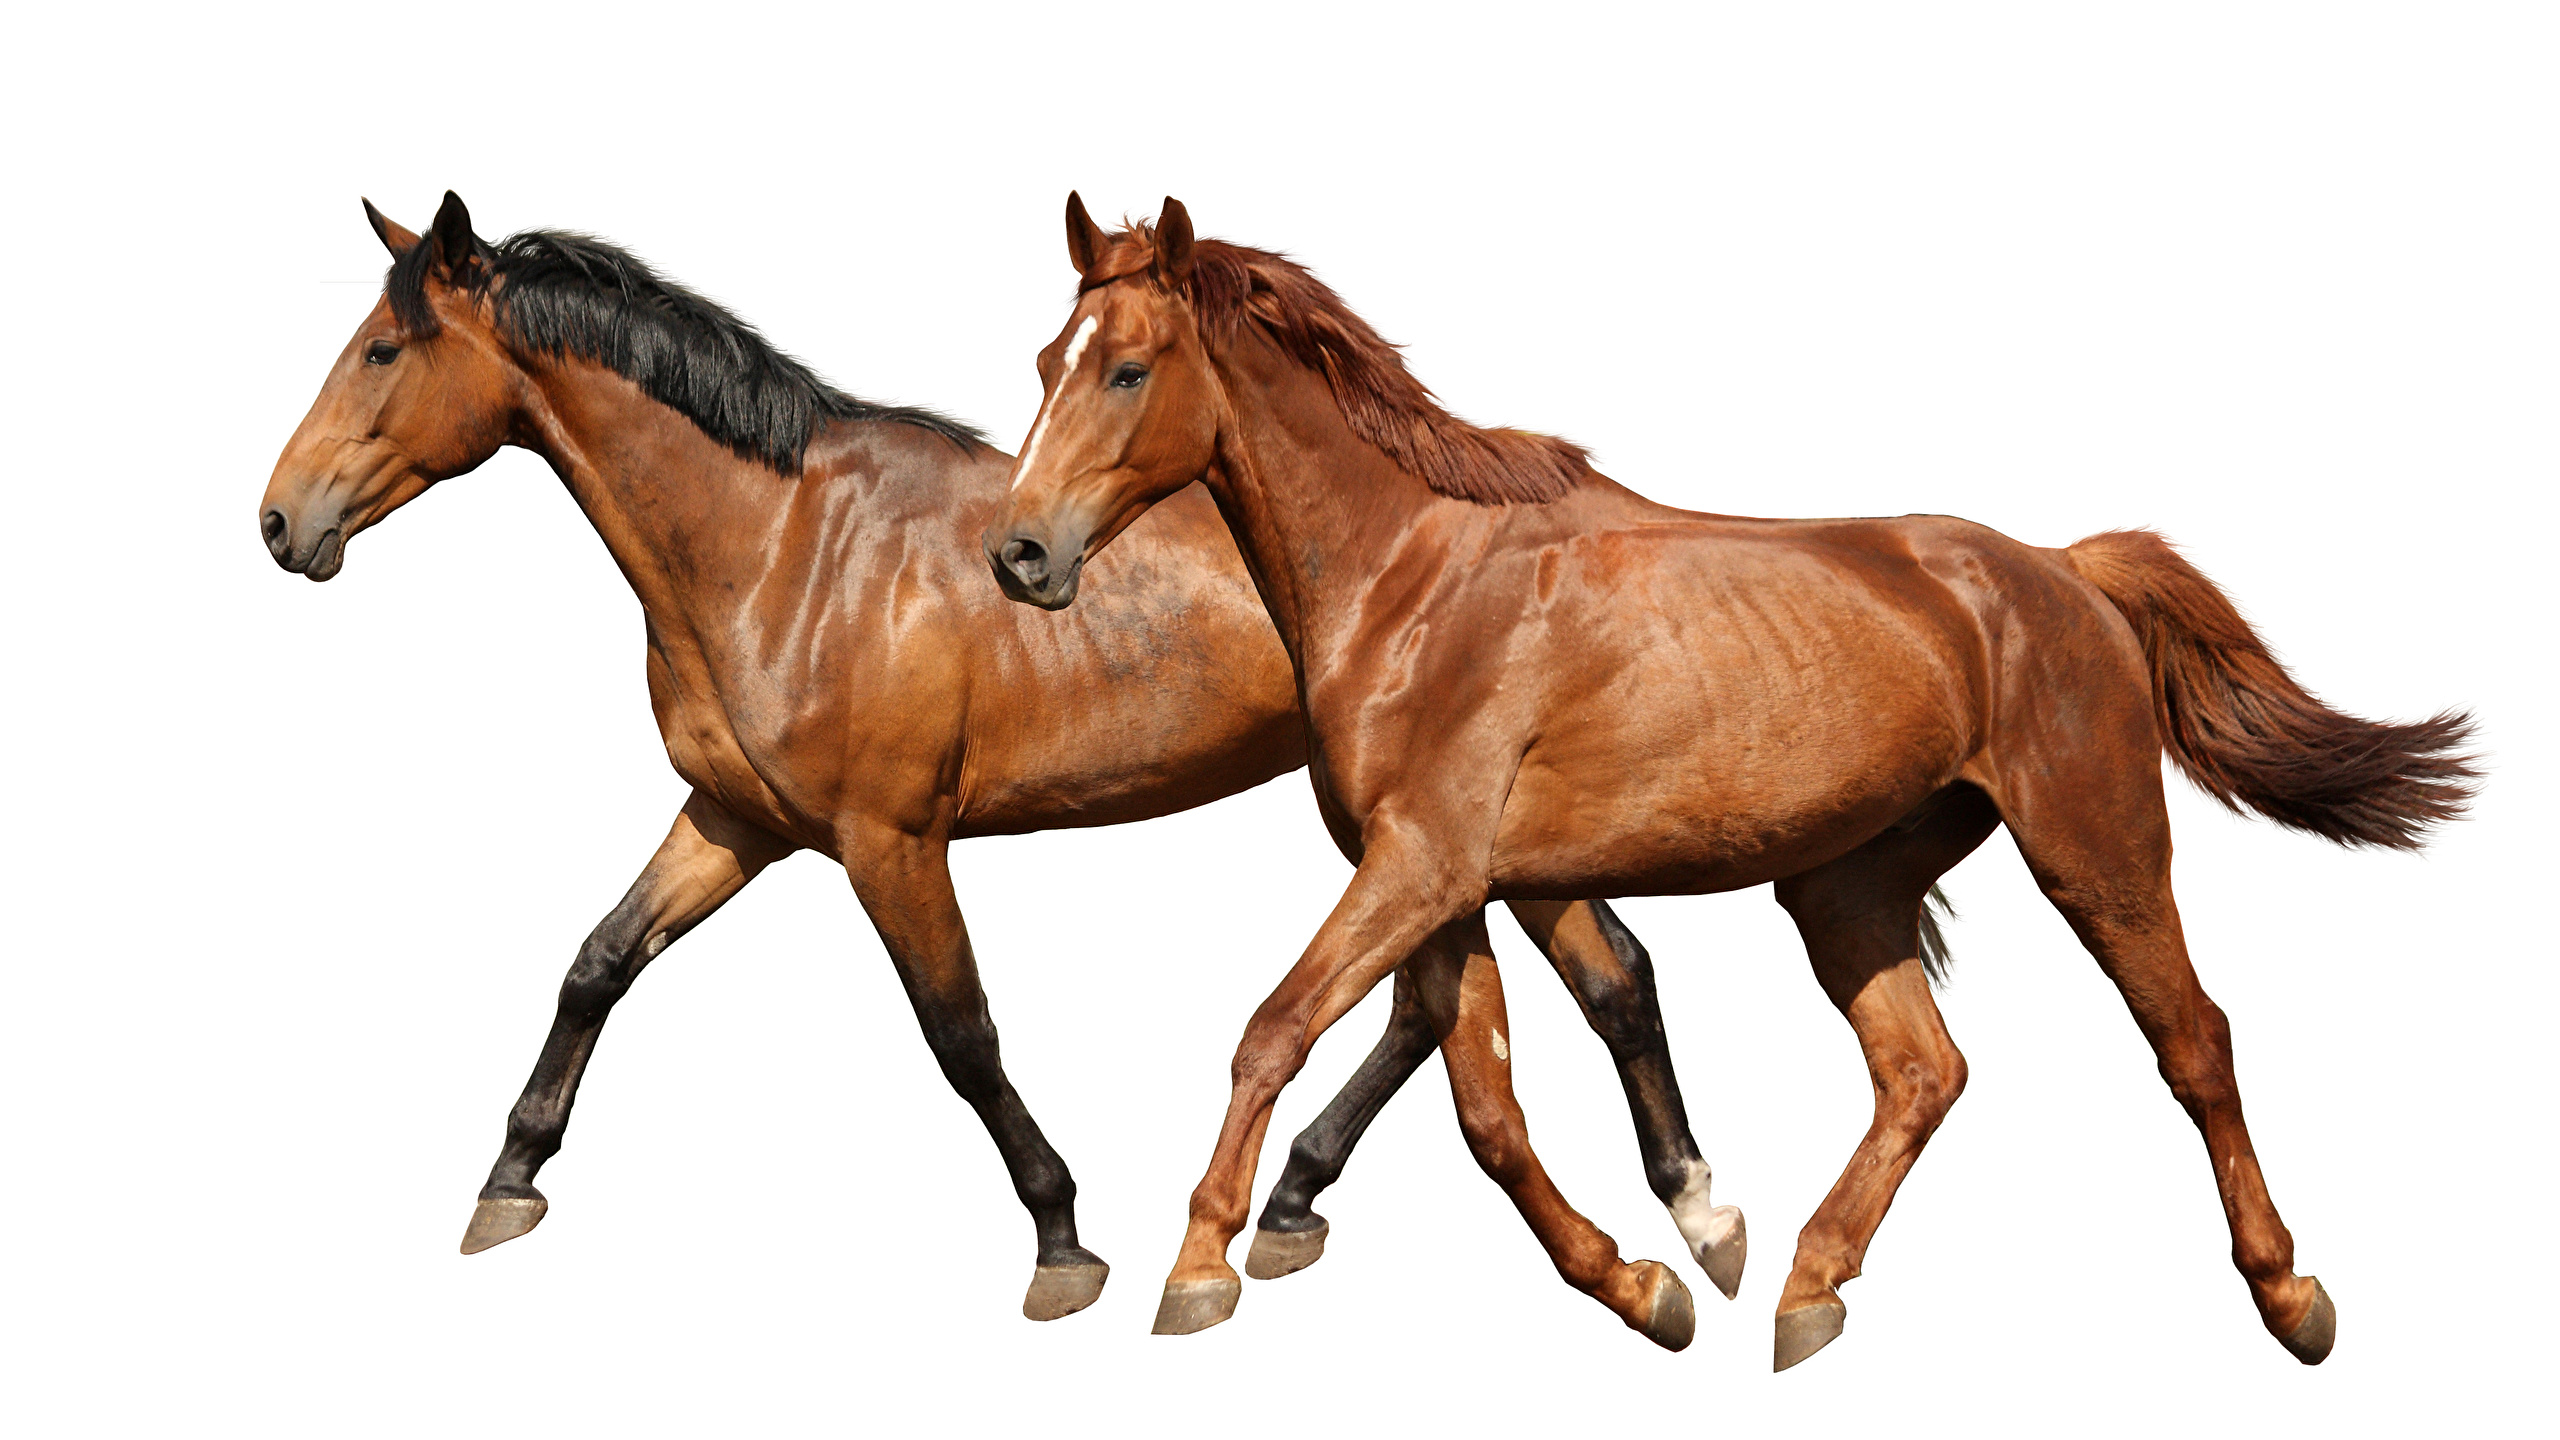 Wallpaper Horses Two Animal White Background 2560x1440